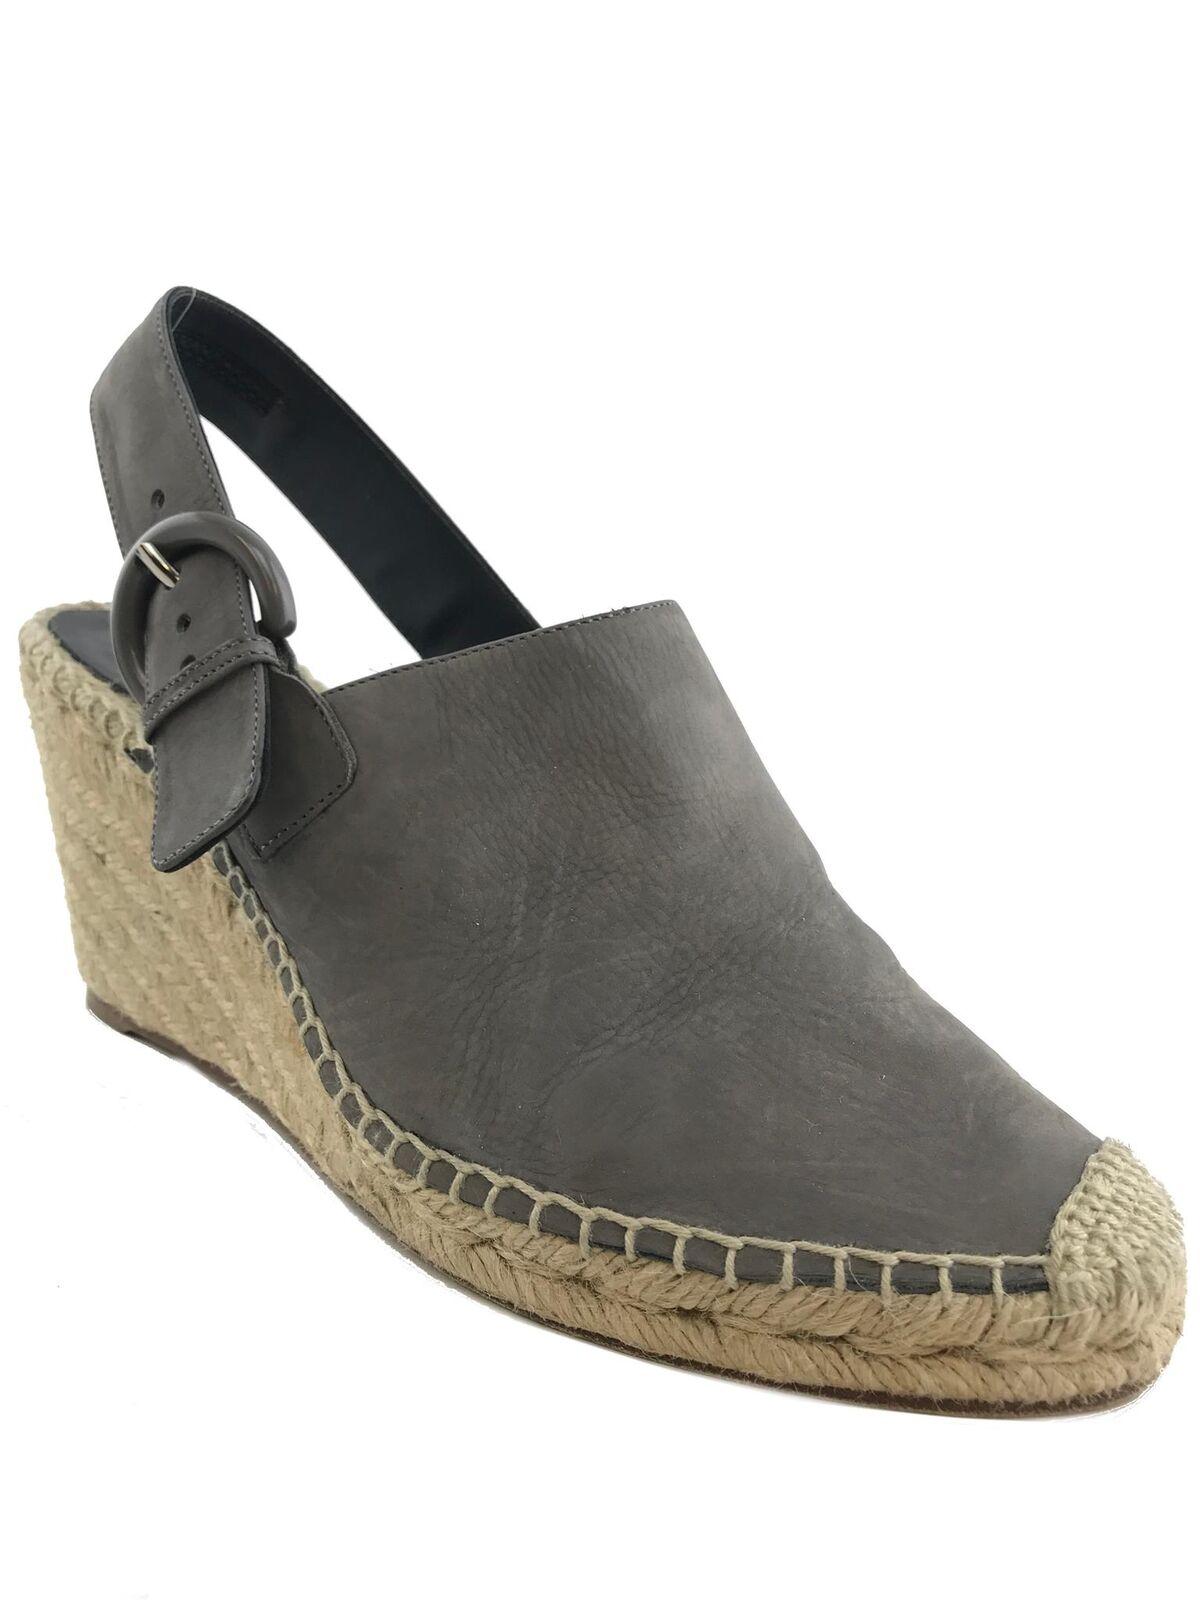 Celine Leather Slingback Espadrilles Size 9